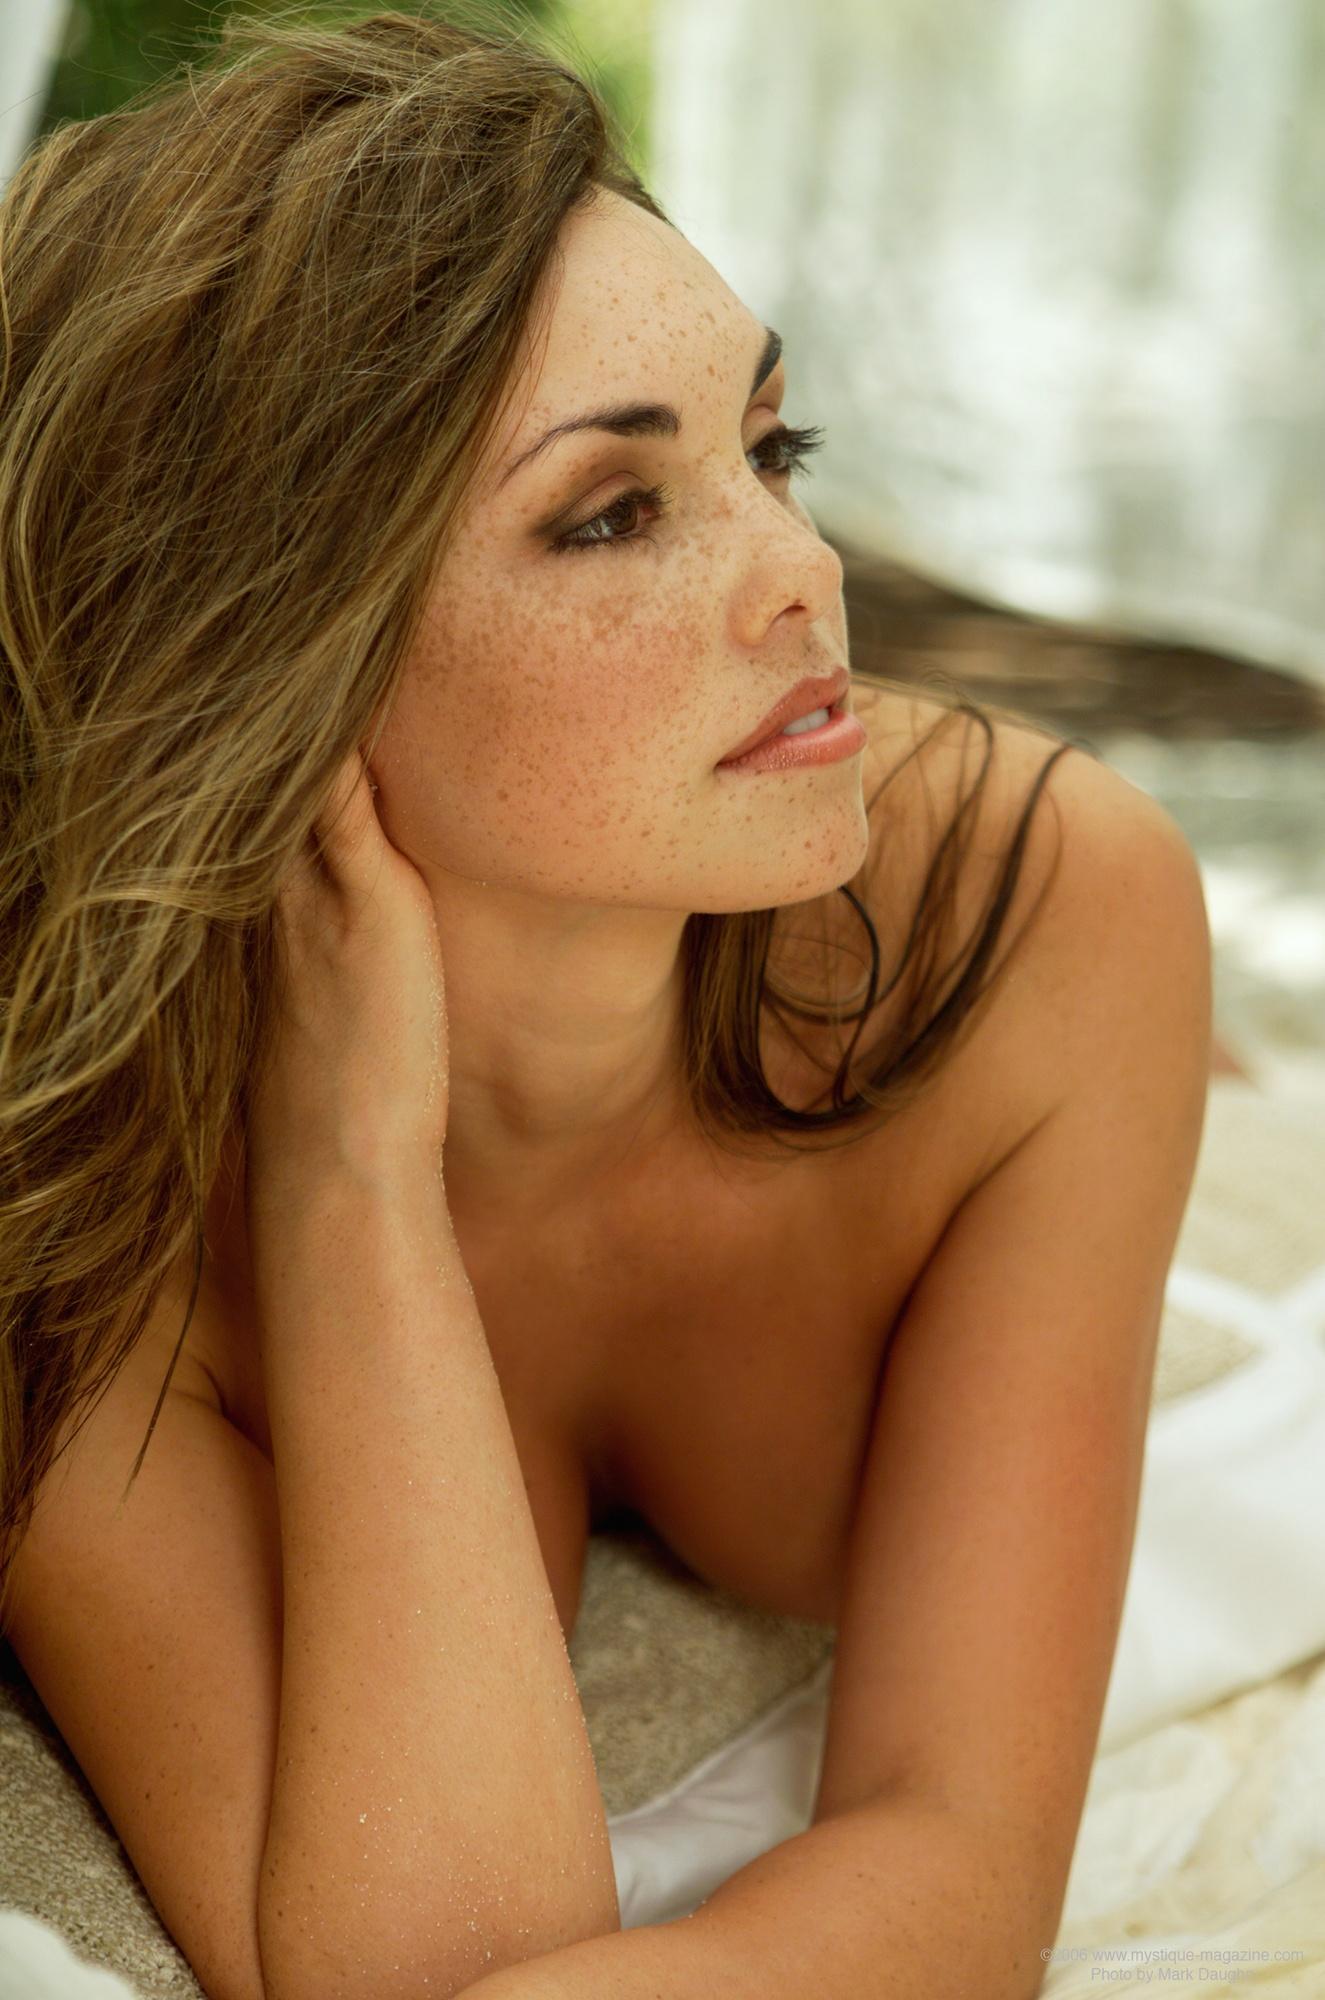 danielle-gamba-boobs-white-fishnet-nude-mystique-15